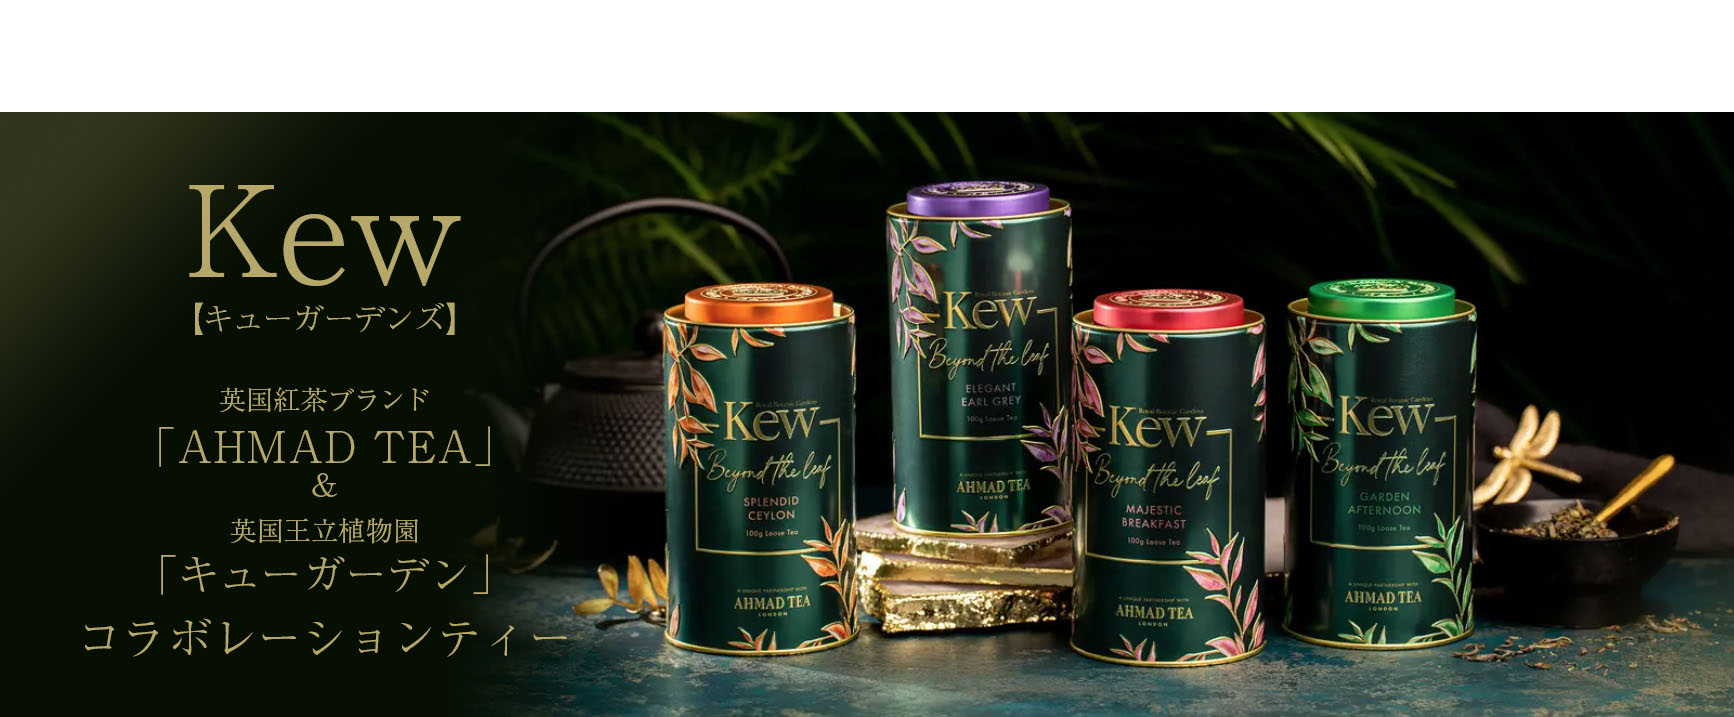 http://torrington.shop21.makeshop.jp/shopdetail/000000000270/